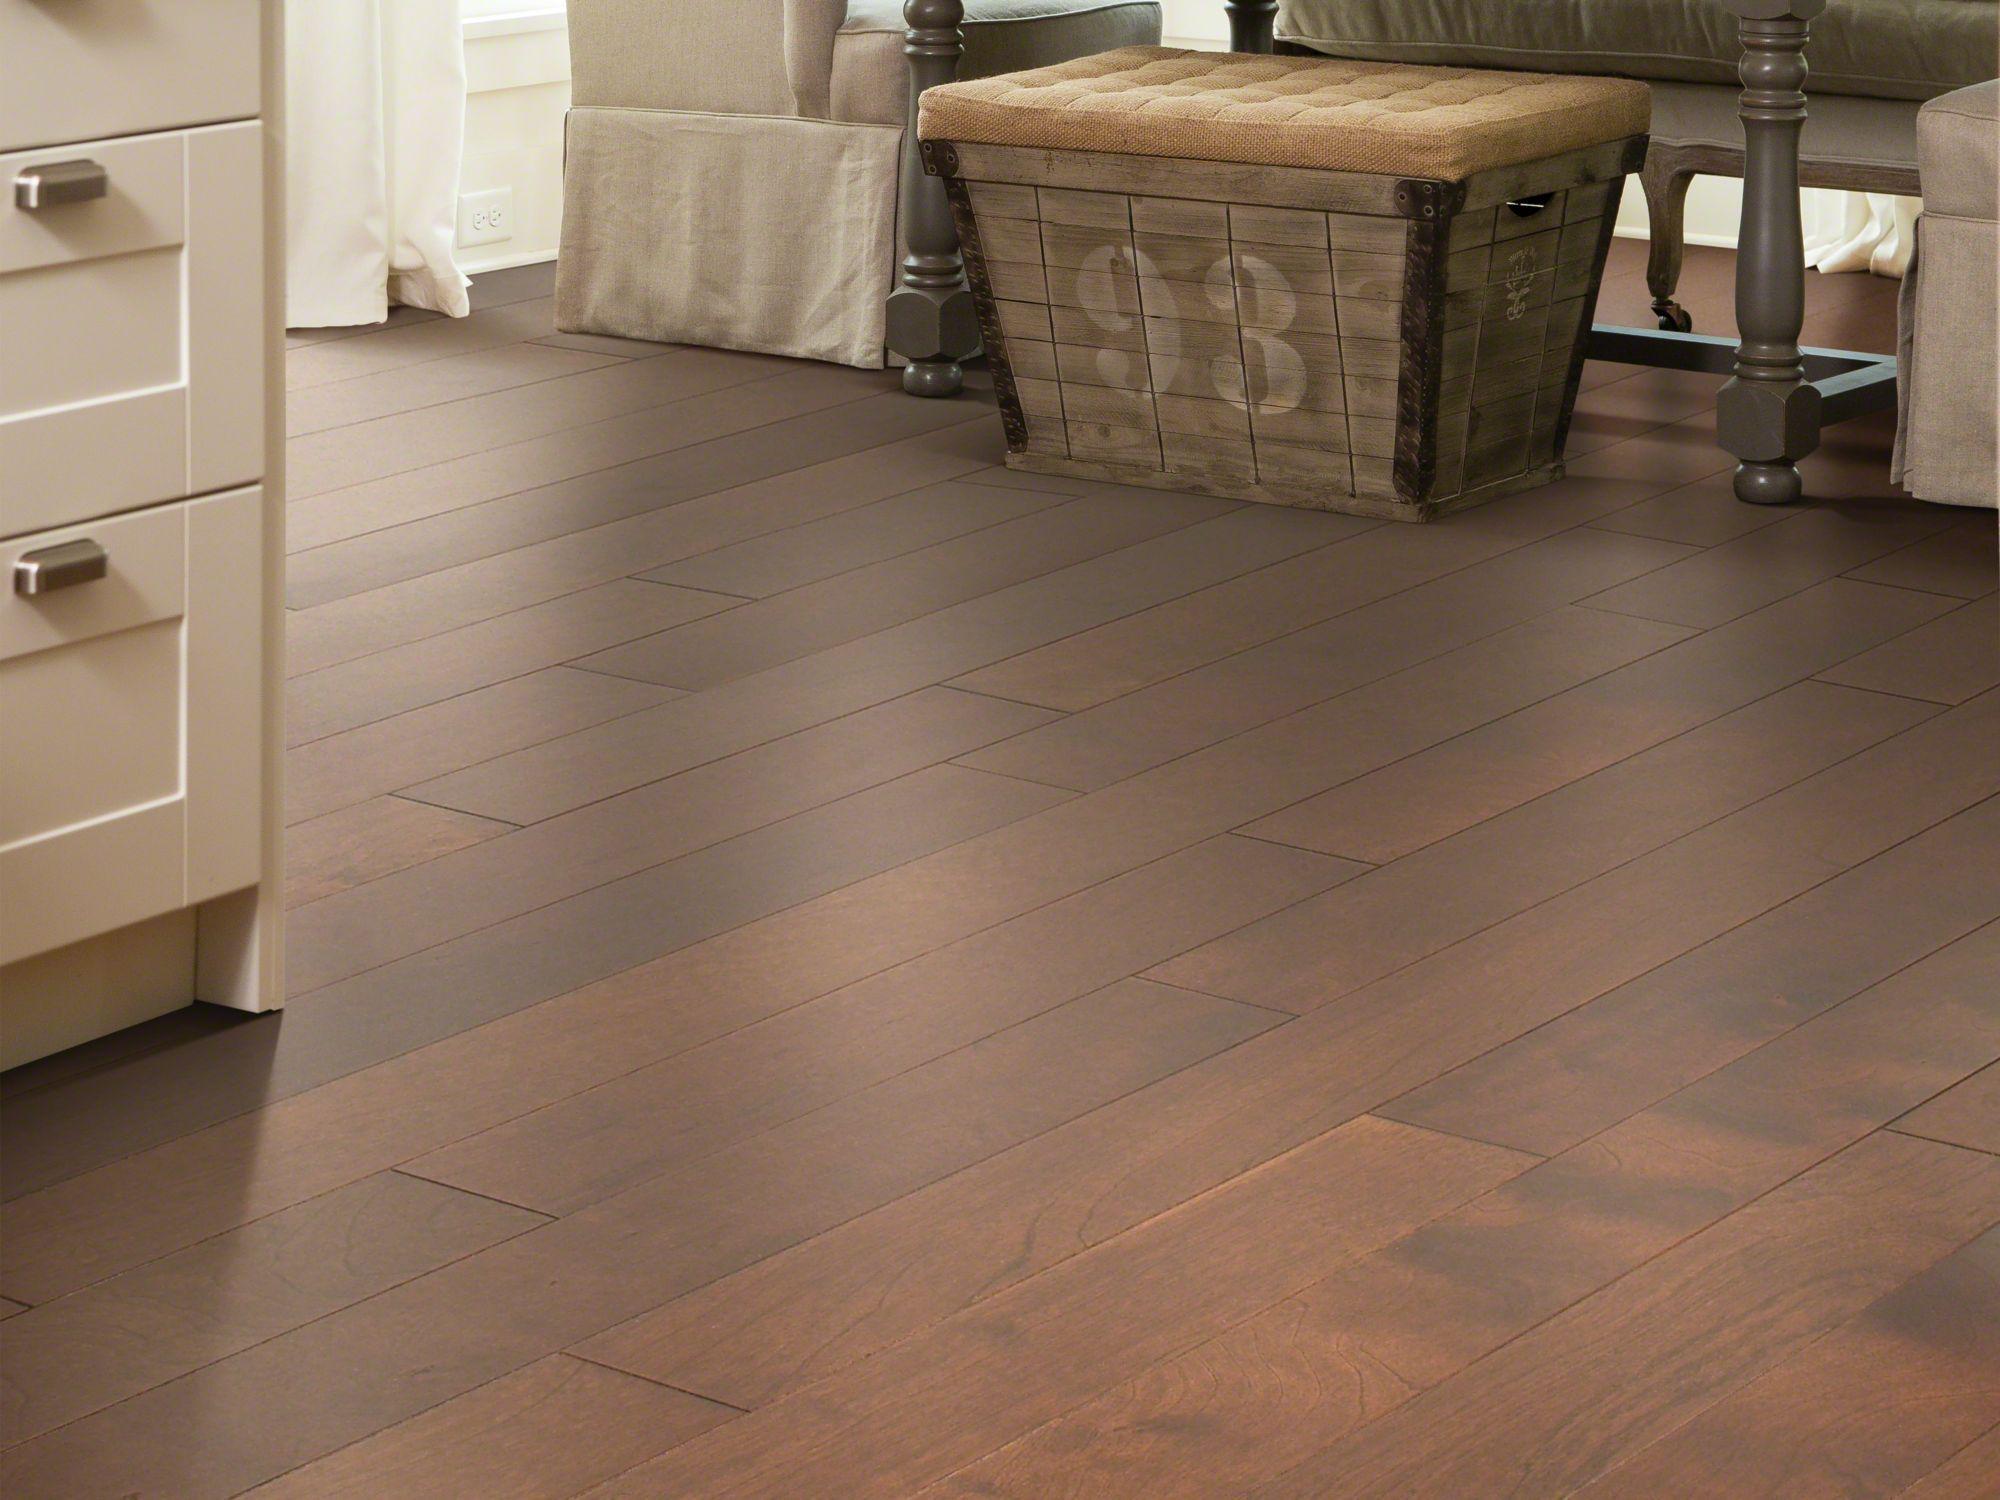 Carpet To Tile Transition Ideas Carpet To Tile Transition Carpet Tiles Diy Flooring Cheap